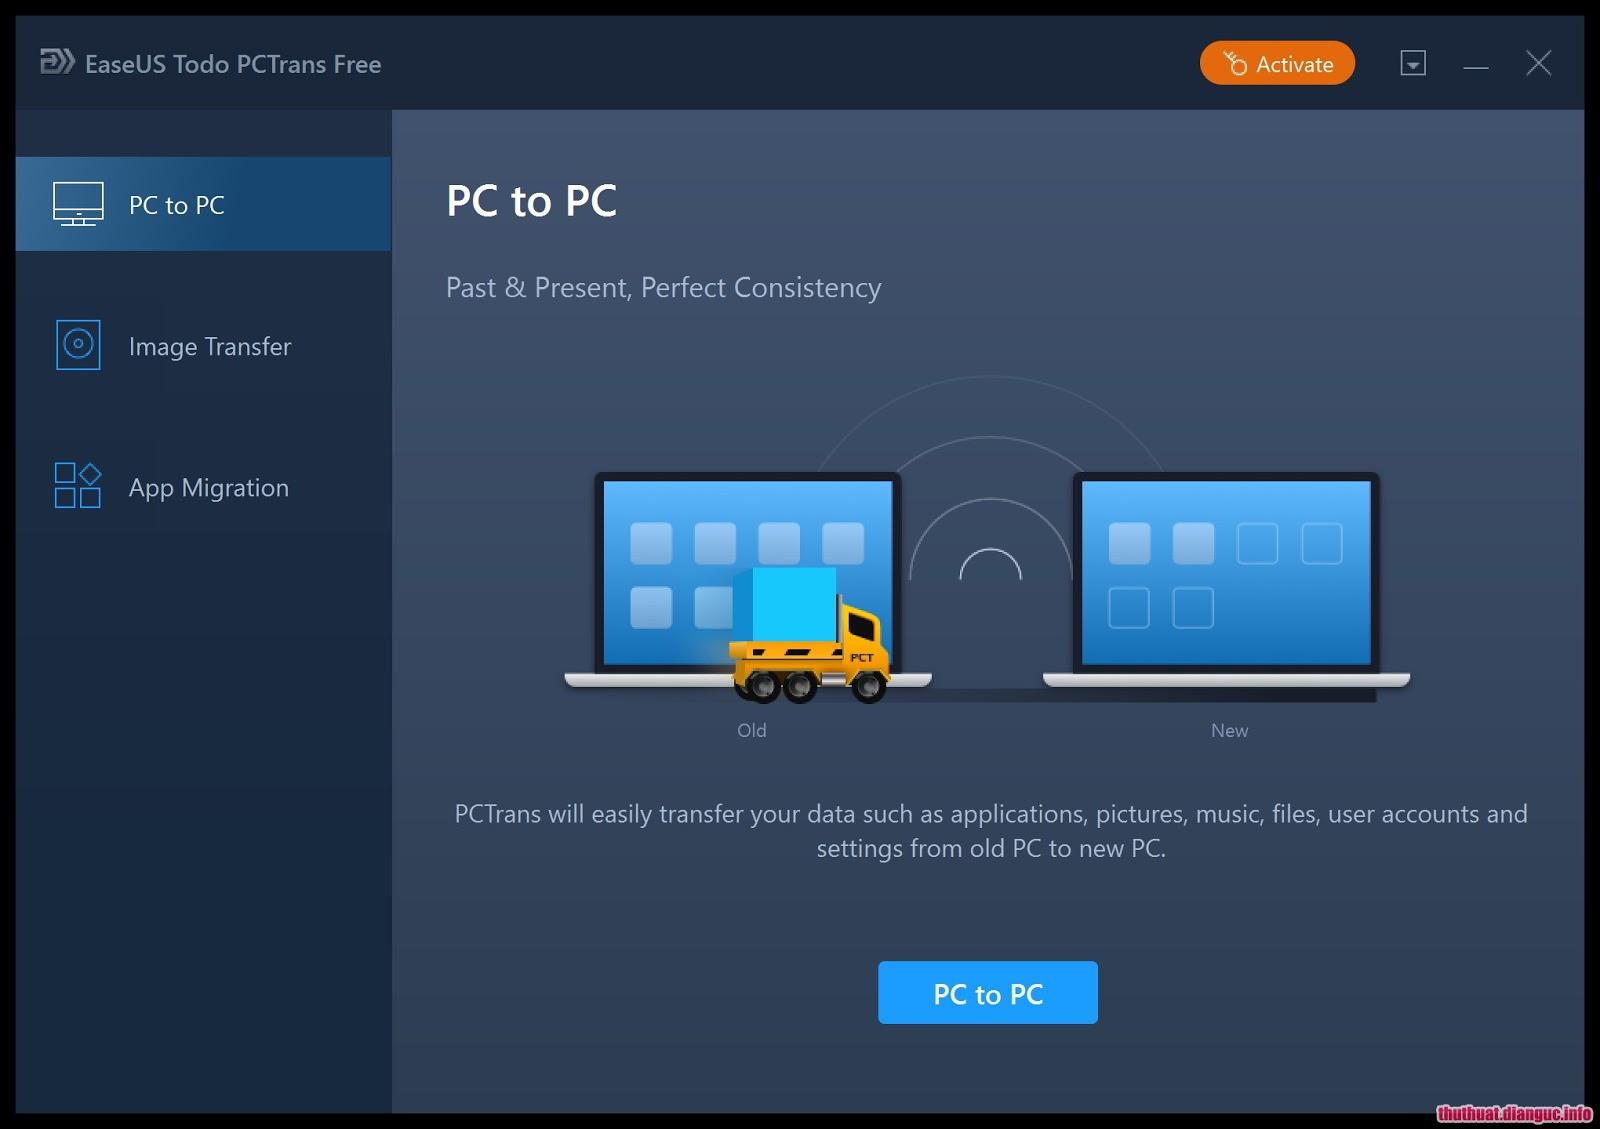 Download EaseUS Todo PCTrans Pro 10.0 Full Crack, tạo bản sao lưu các ứng dụng, EaseUS Todo PCTrans Pro, EaseUS Todo PCTrans Pro free download, EaseUS Todo PCTrans Pro full key